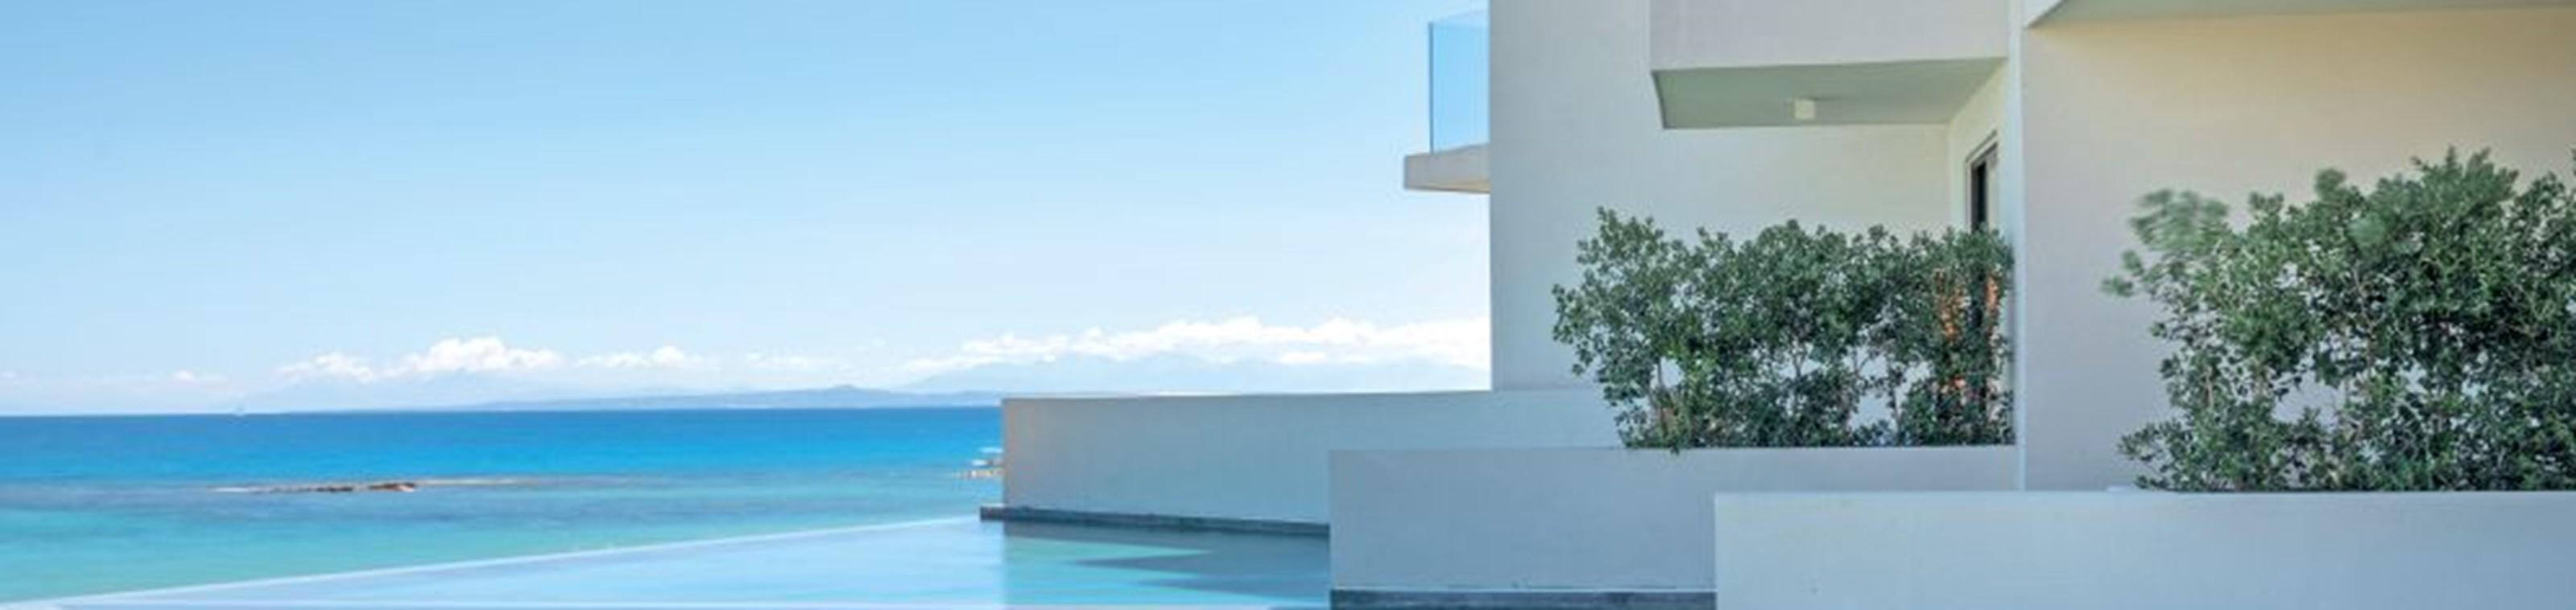 Luxueuze adults only in Griekenland